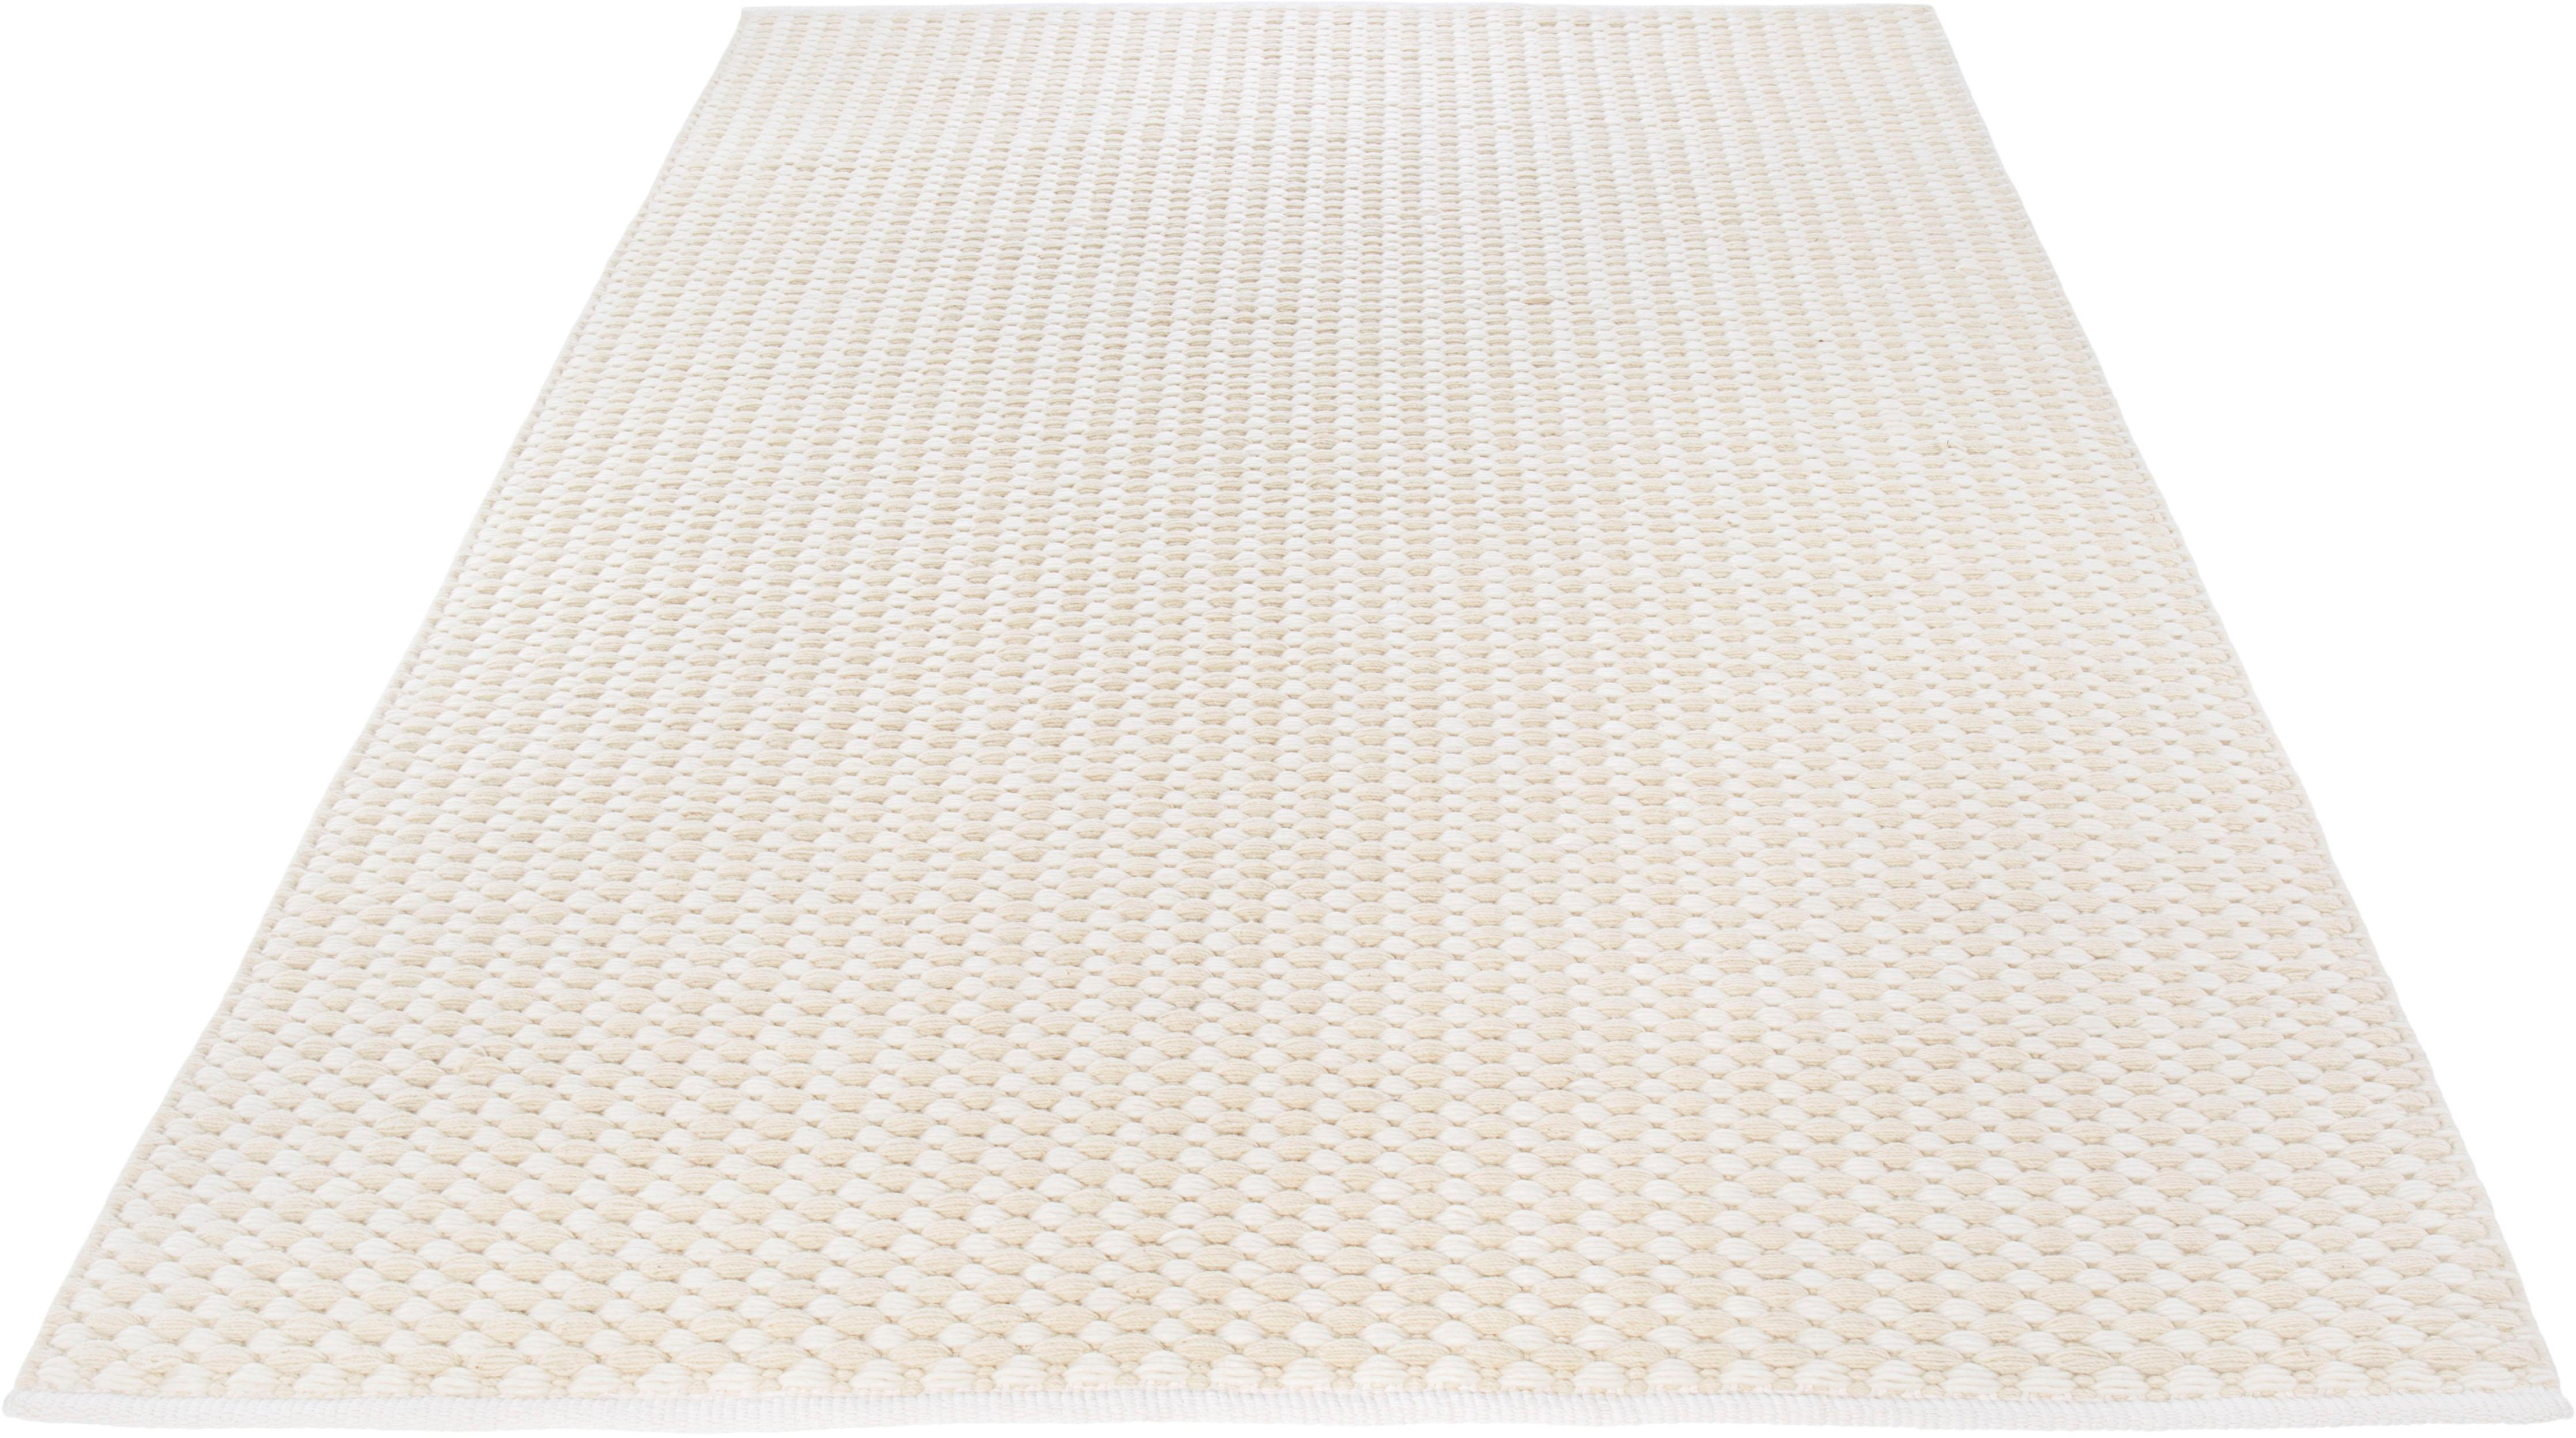 Teppich Finn Wohnidee rechteckig Höhe 12 mm handgewebt